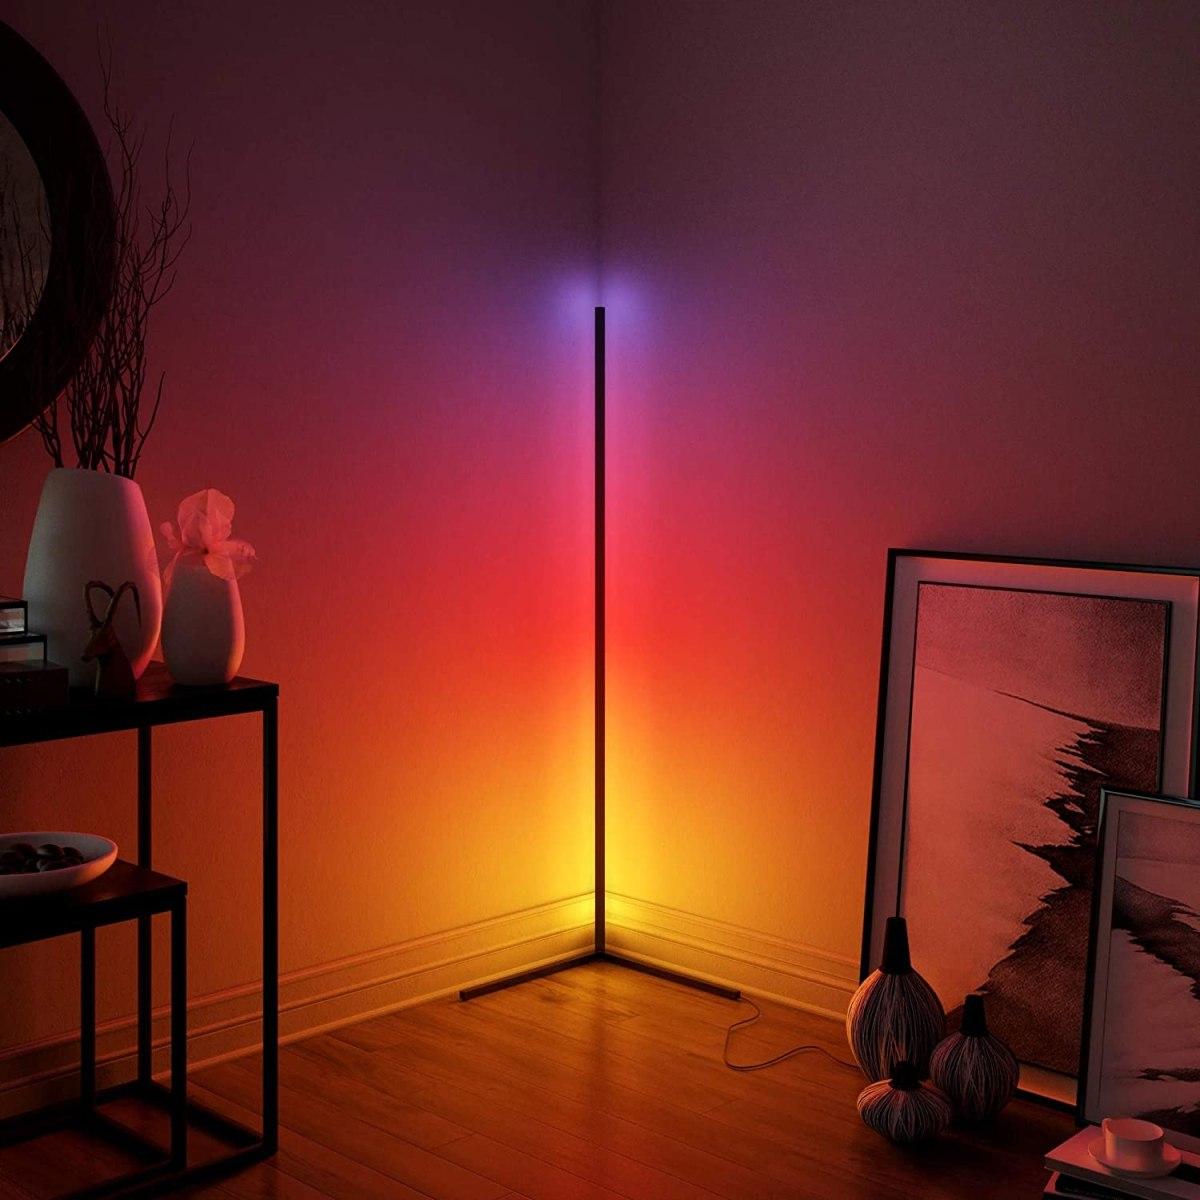 lampadaire d'ambiance led rvb